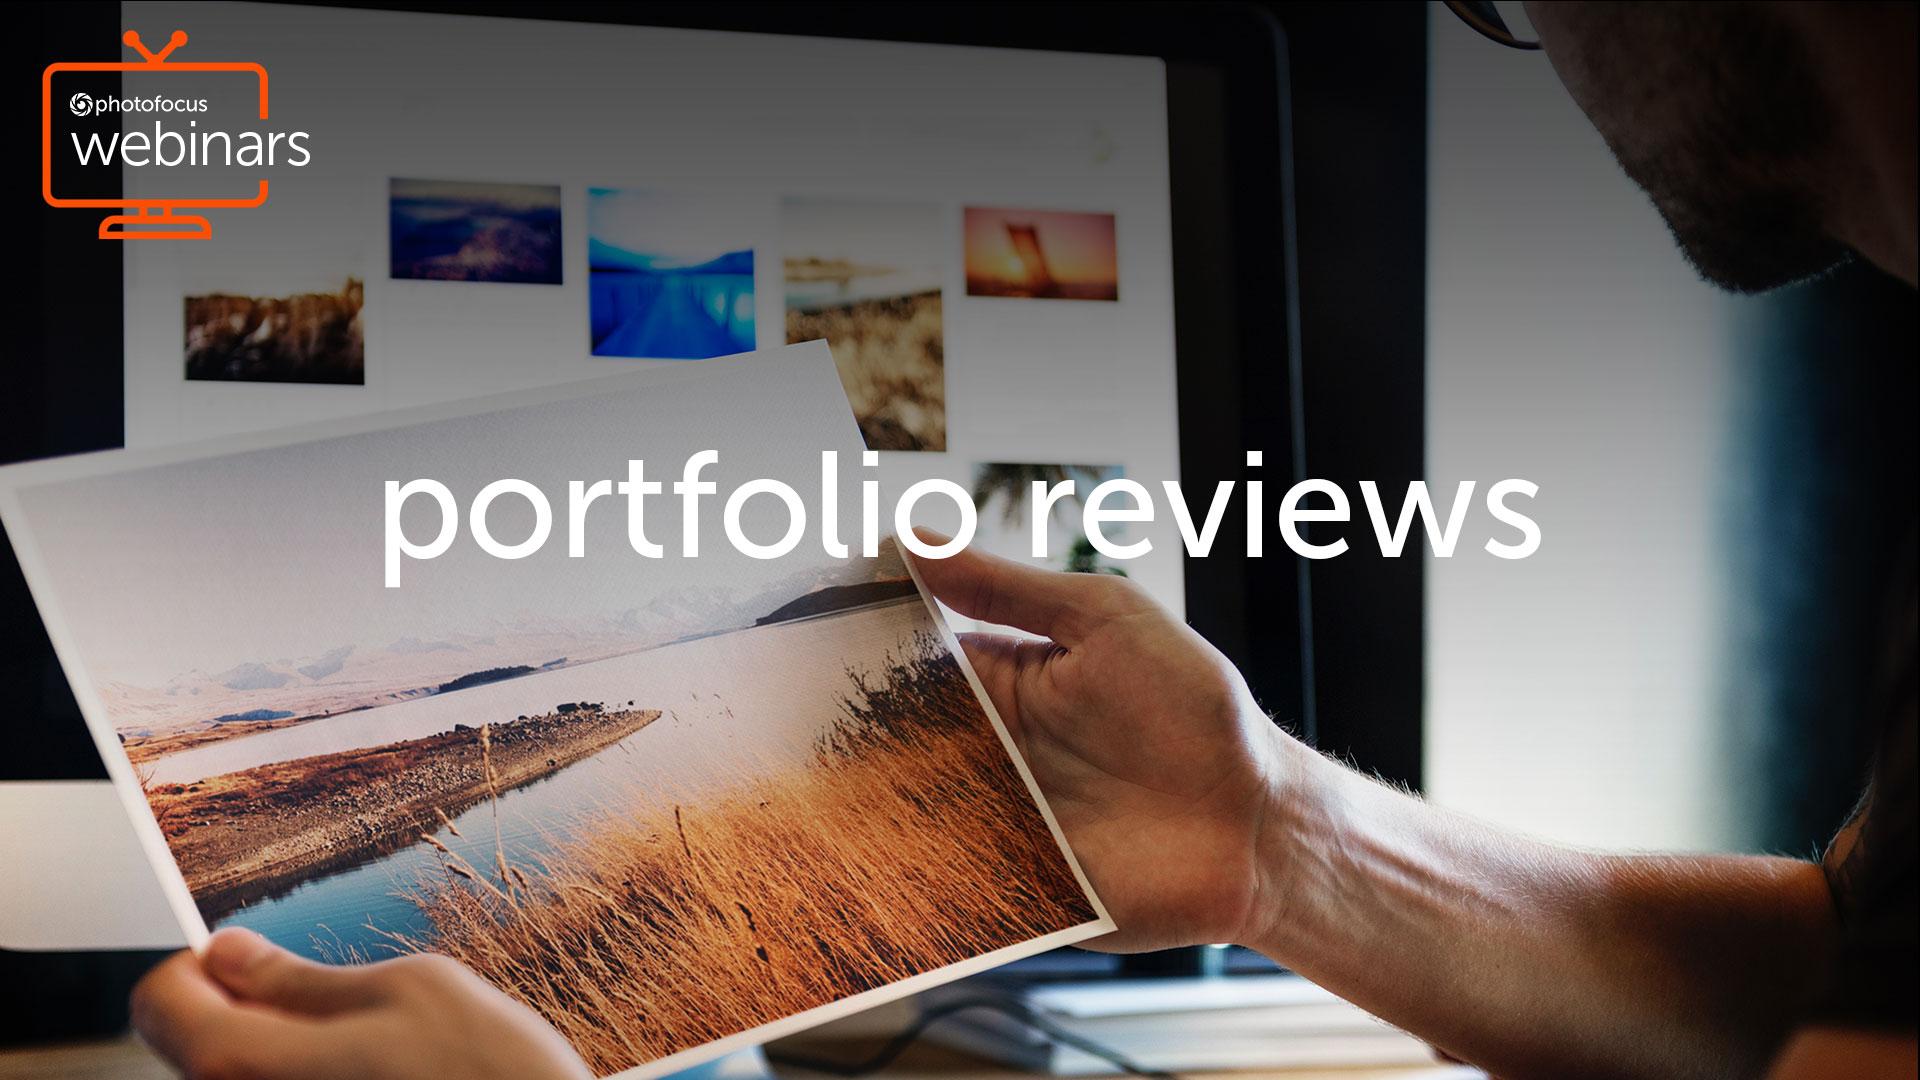 webinars-portfolio-reviews